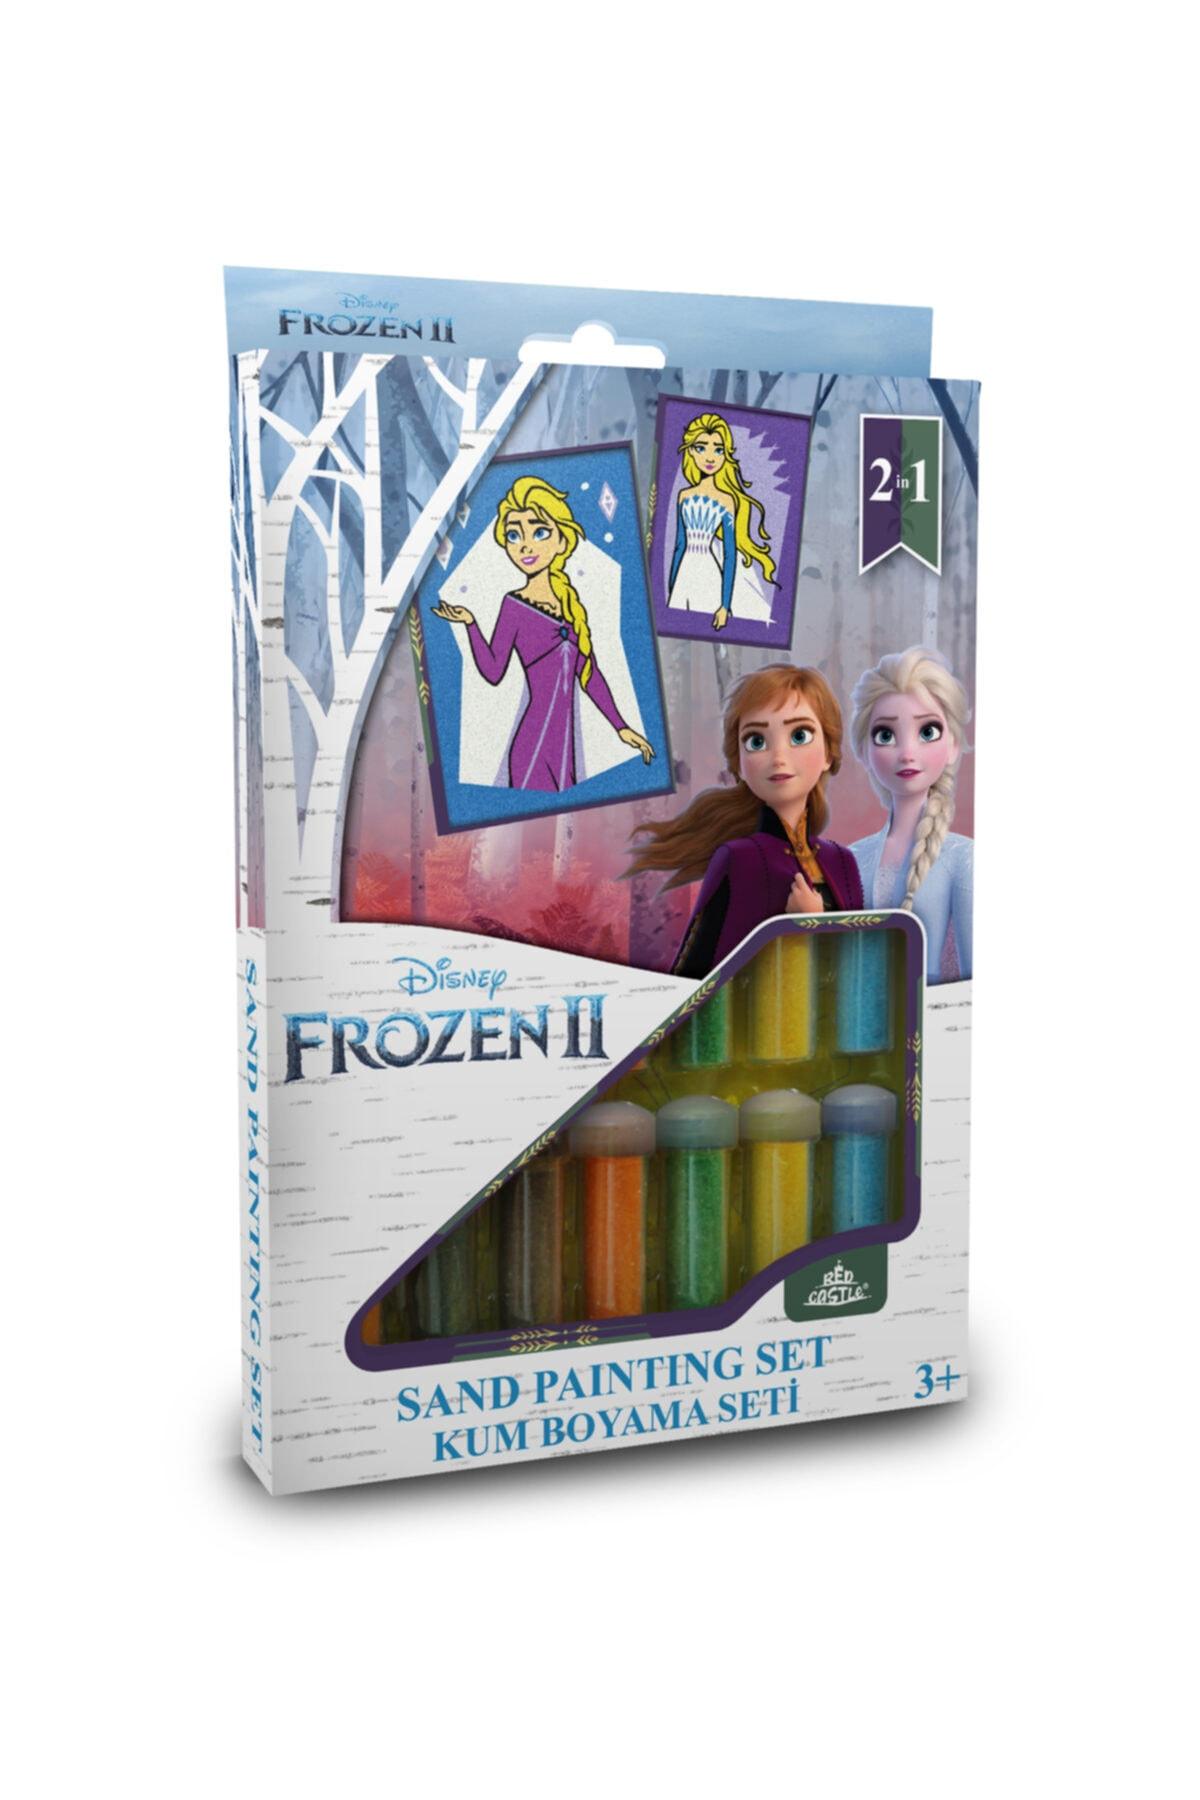 Red Castle Kum Boyama Aktivite Seti Karlar Ülkes Frozen Iı Elsa Anna 1